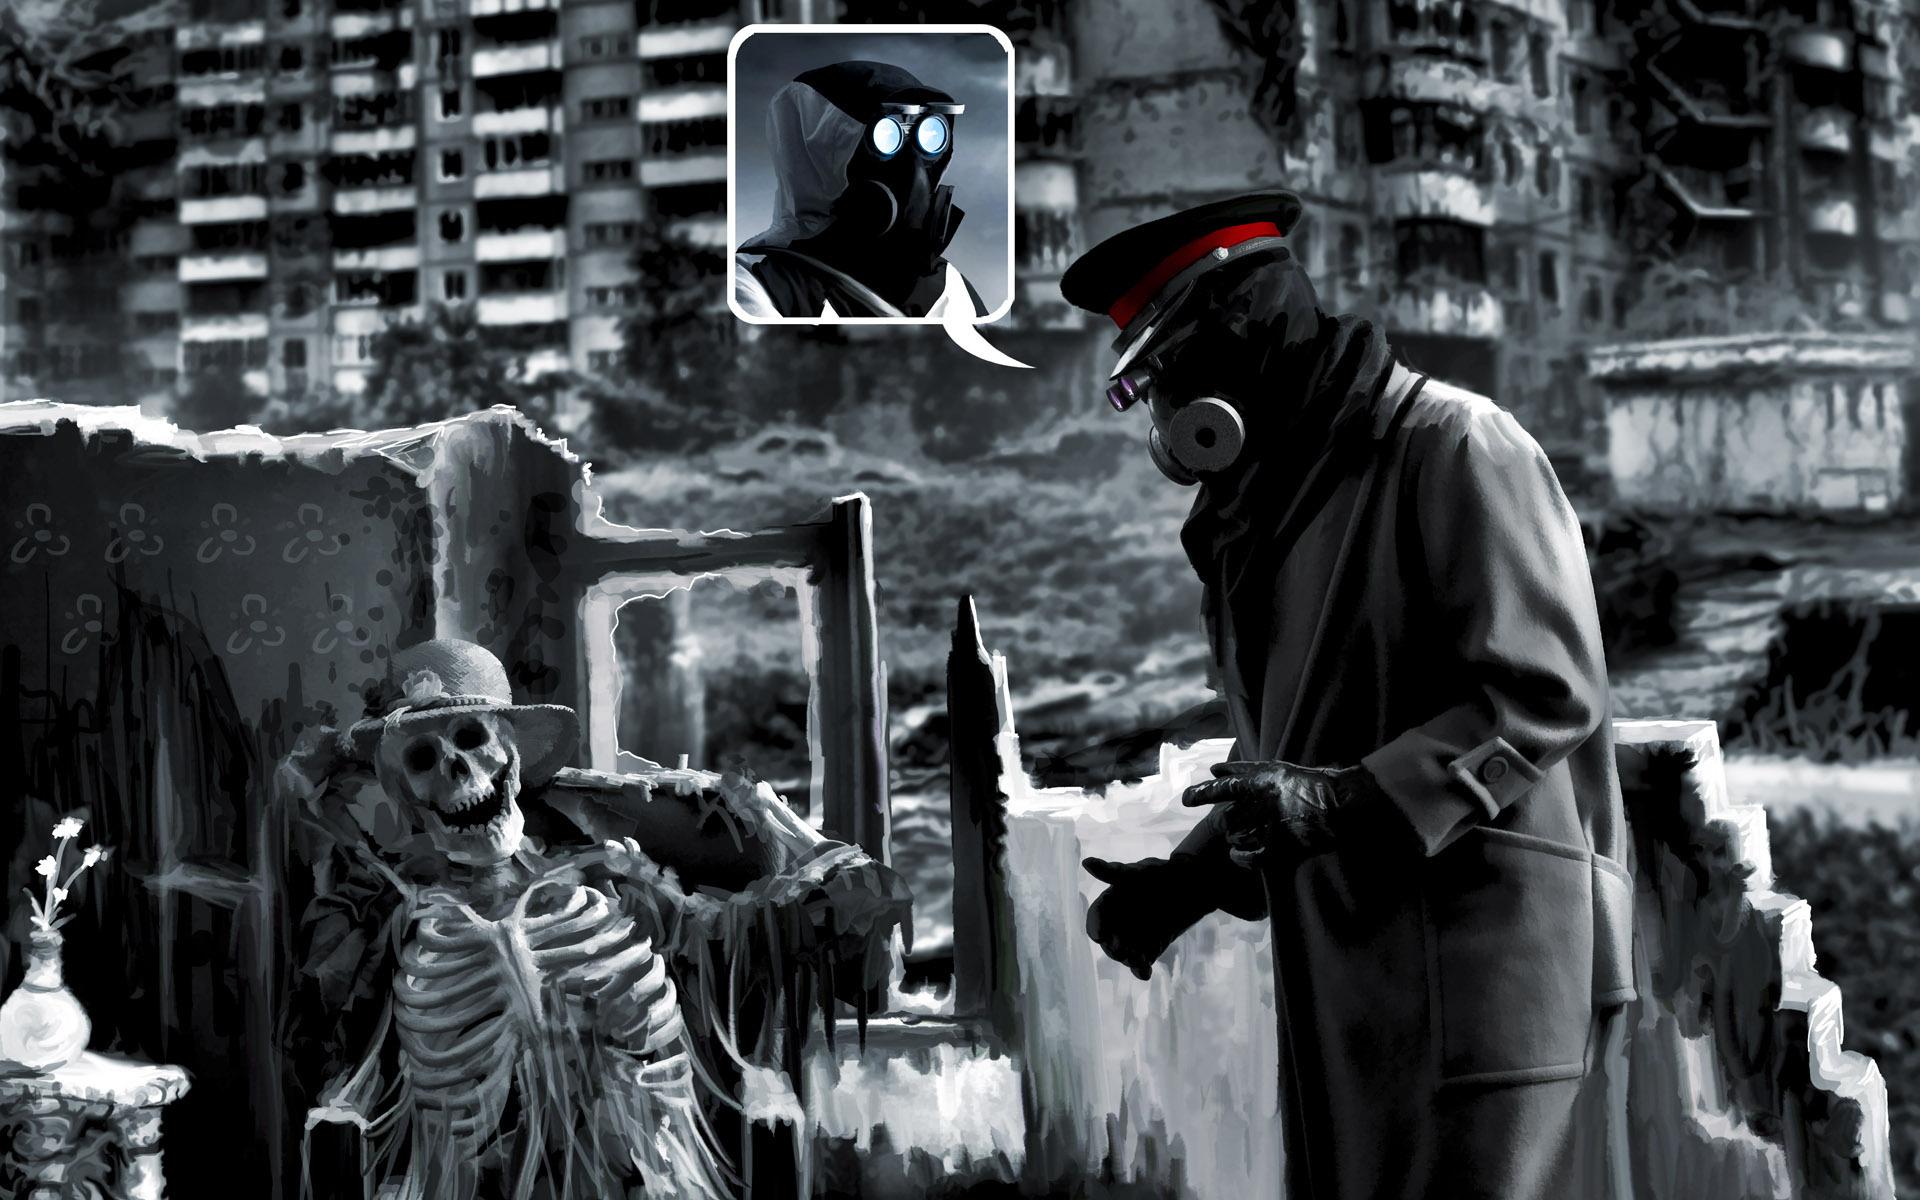 Wallpaper 1920x1200 Px Apocalyptic Comic Comics Dark